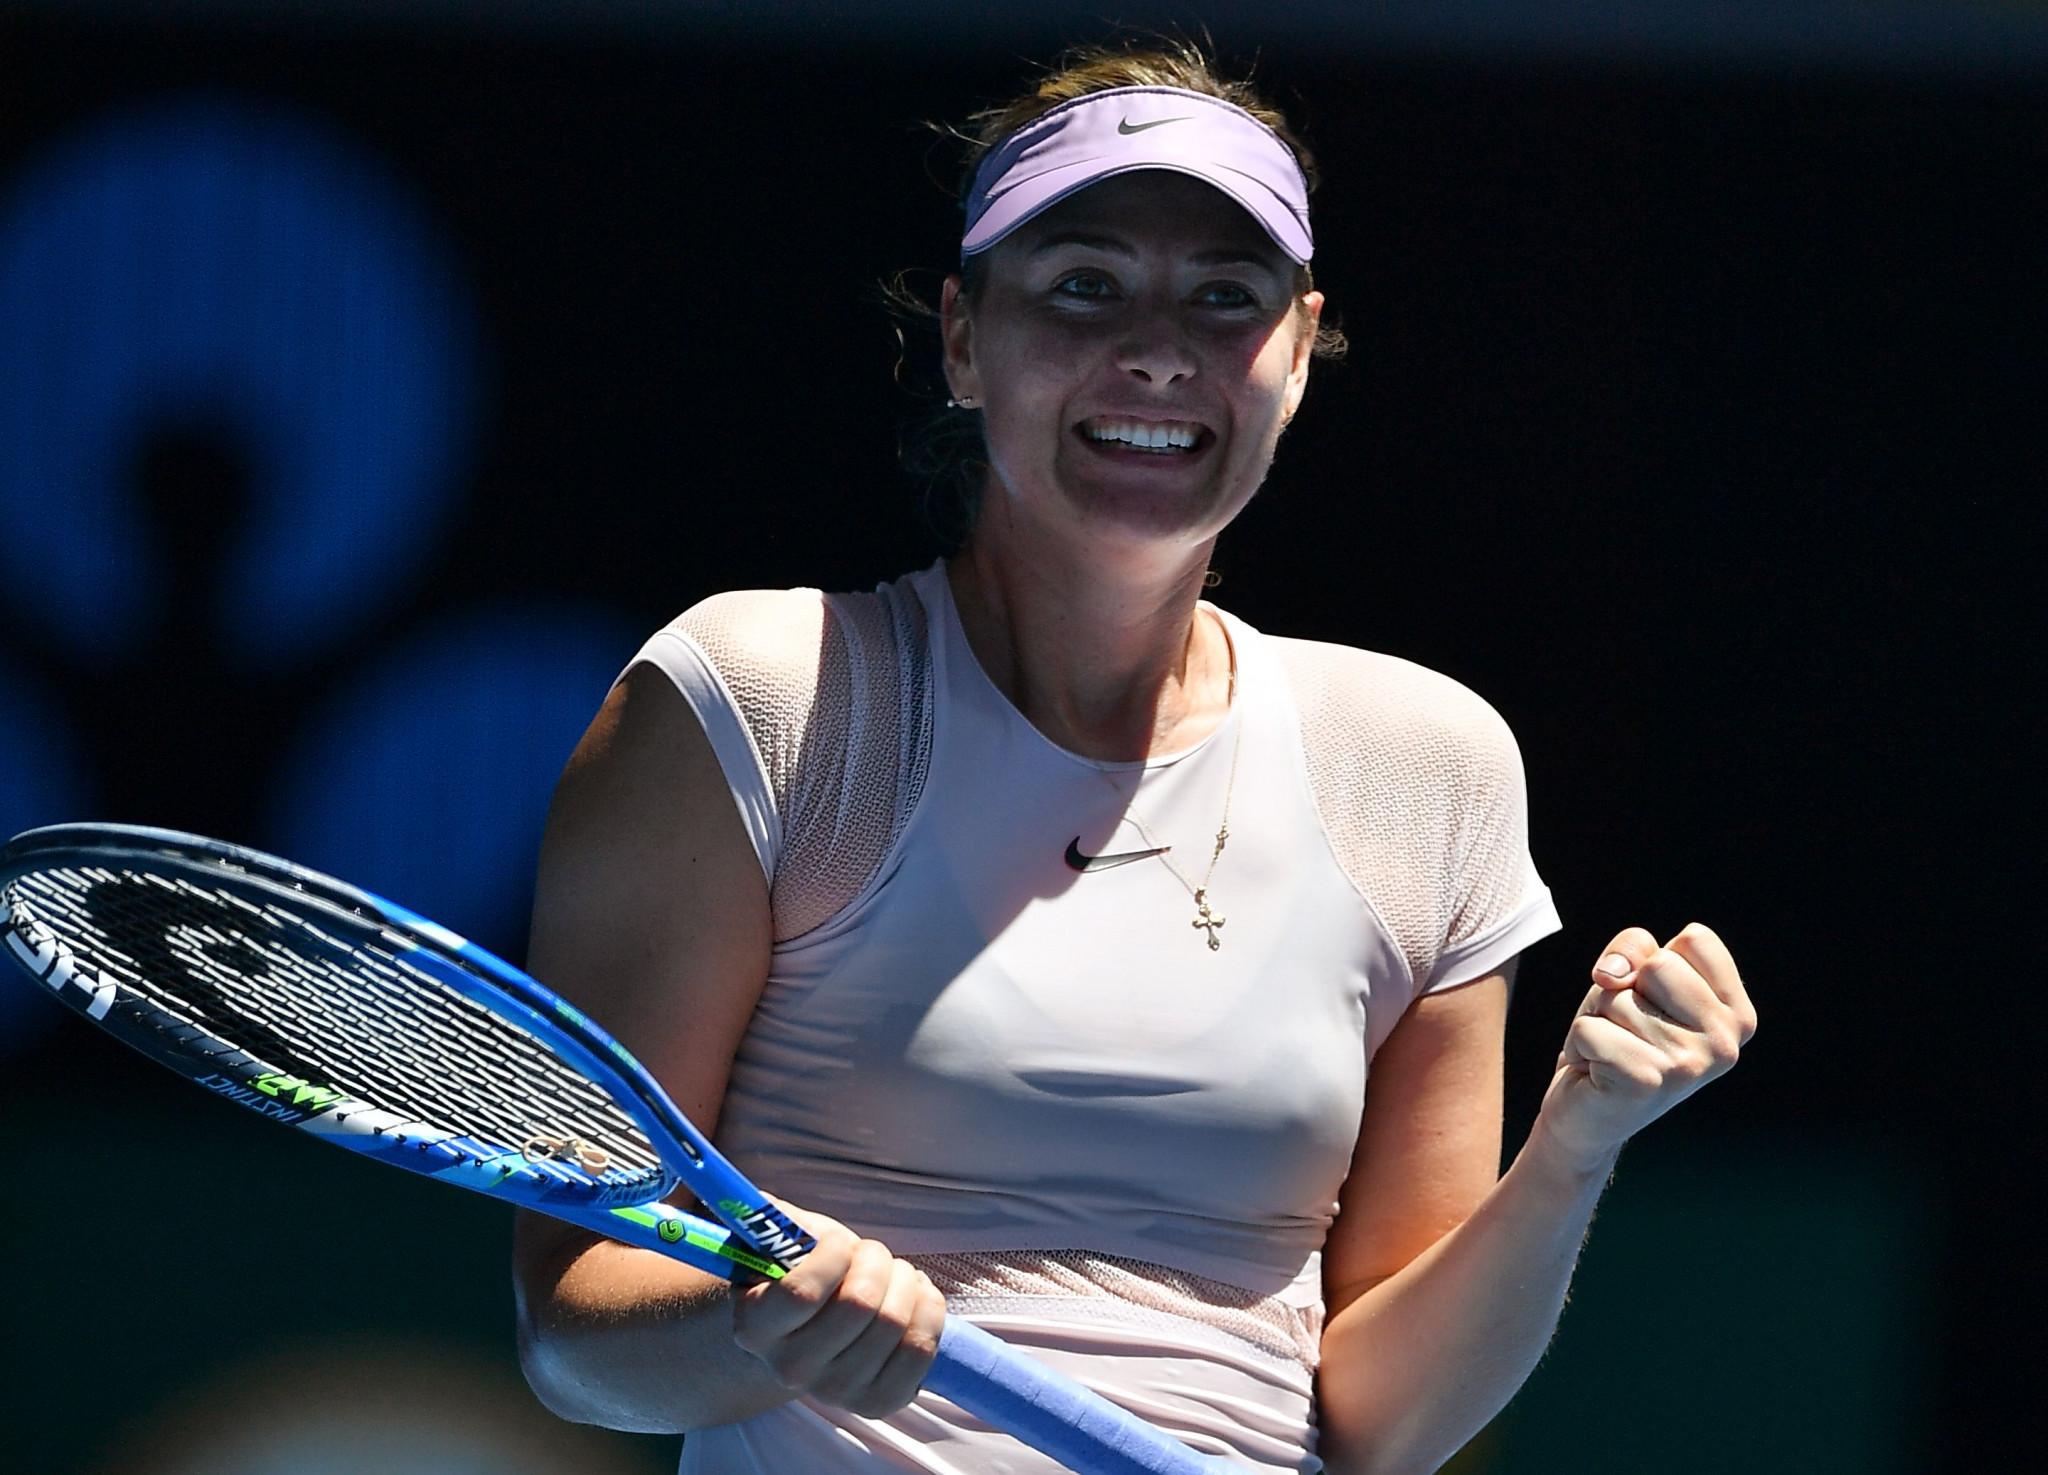 Sharapova and Djokovic through on day two of Australian Open